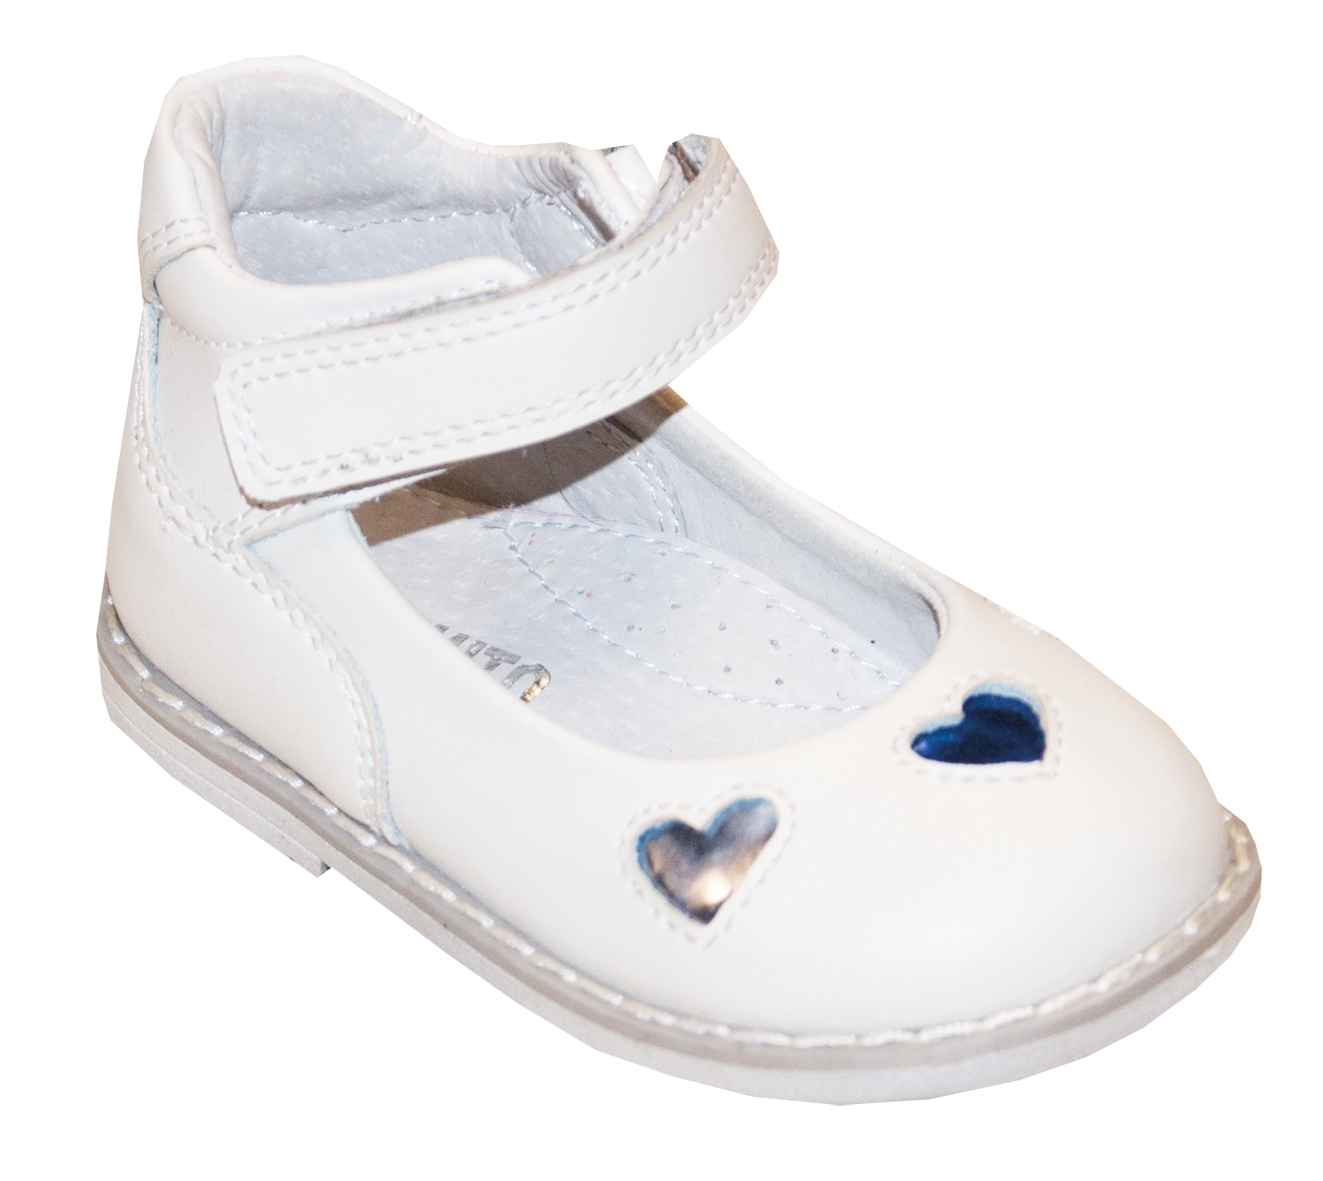 Туфли Barkito Туфли для девочки Barkito, белые цена и фото